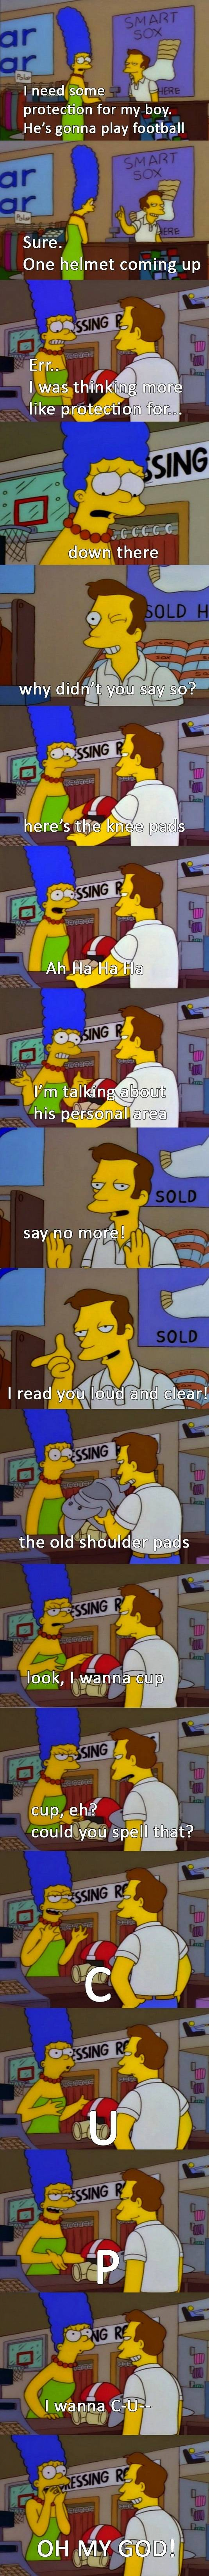 Simpsons dating lainaus merkit